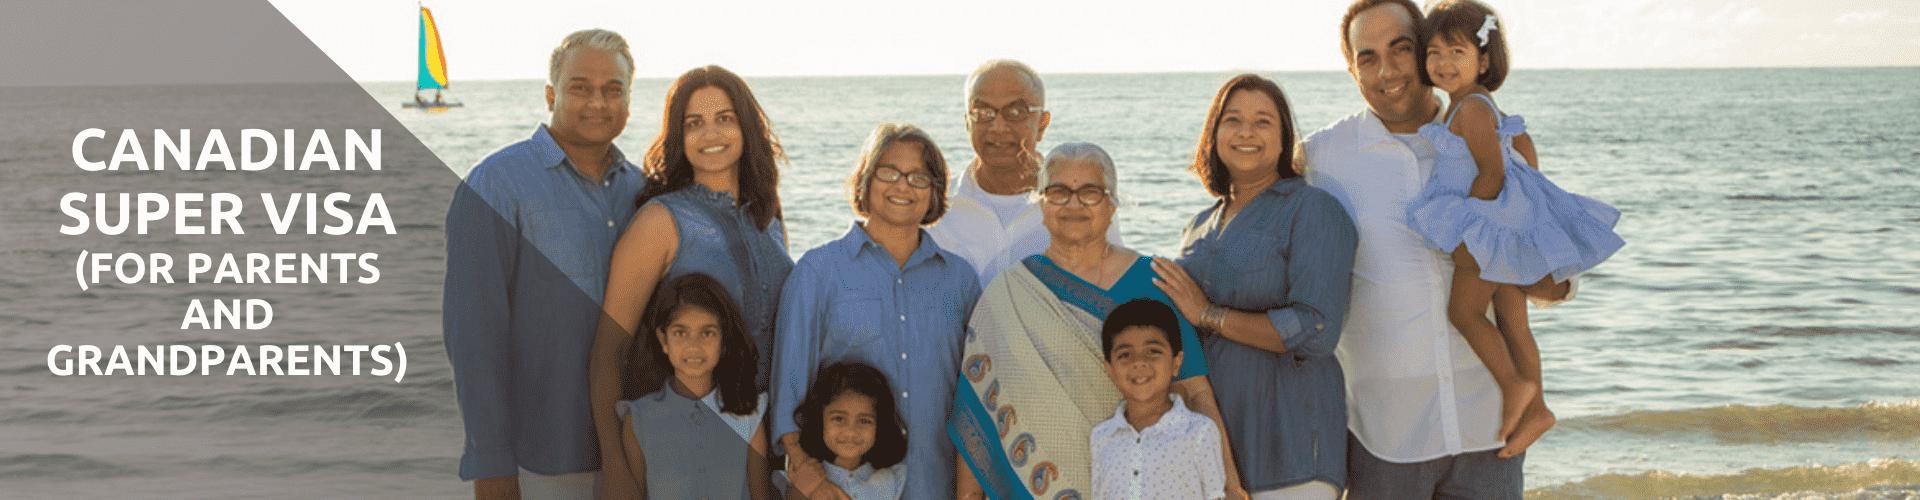 Canadian Super Visa (for Parents and Grandparents)